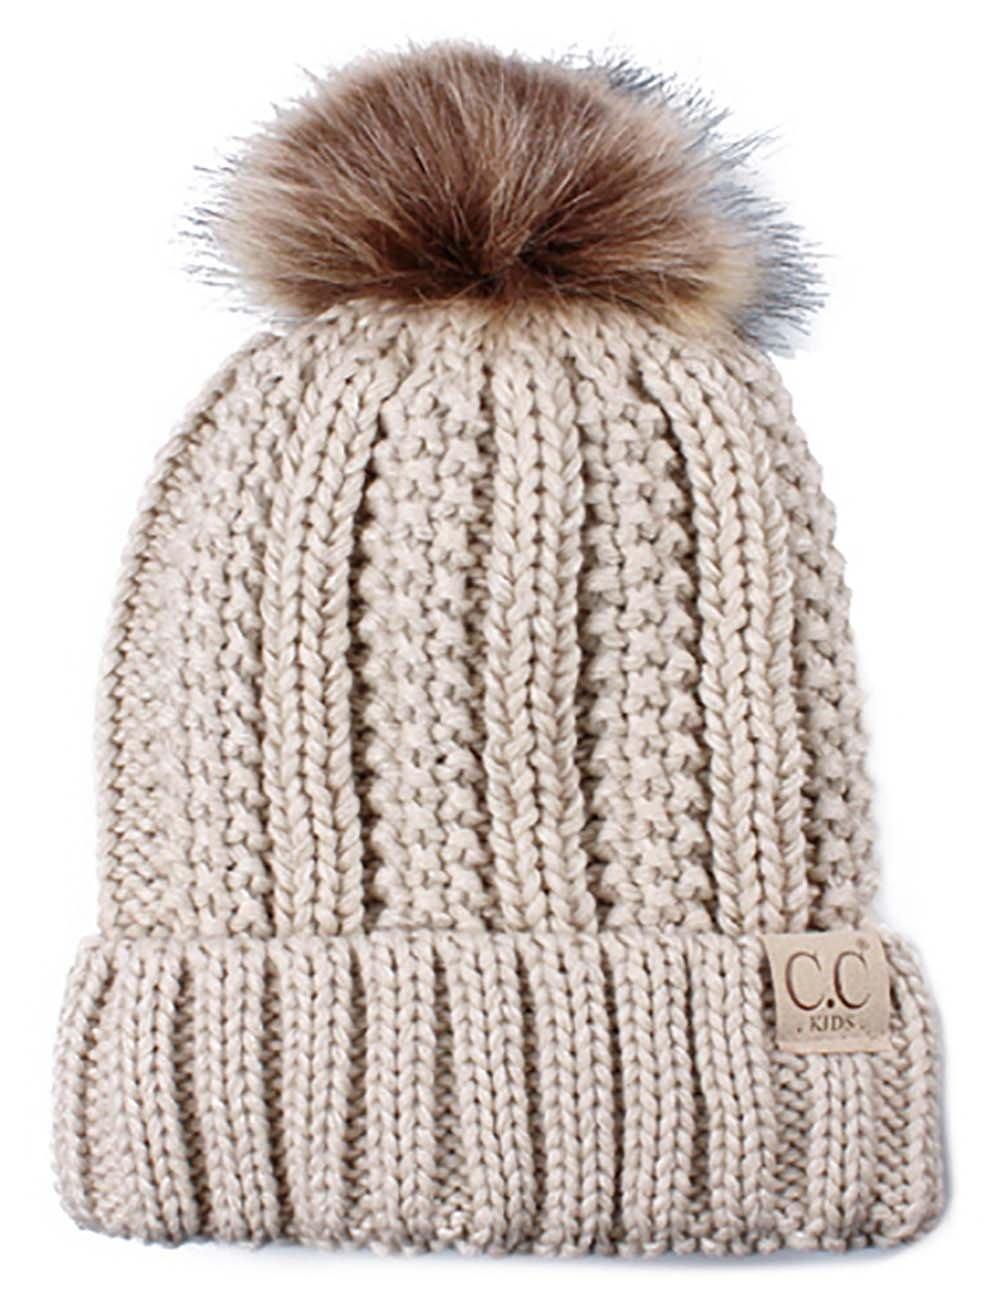 H-1820kids-60 Fuzzy Lined Pom Hat - Beige